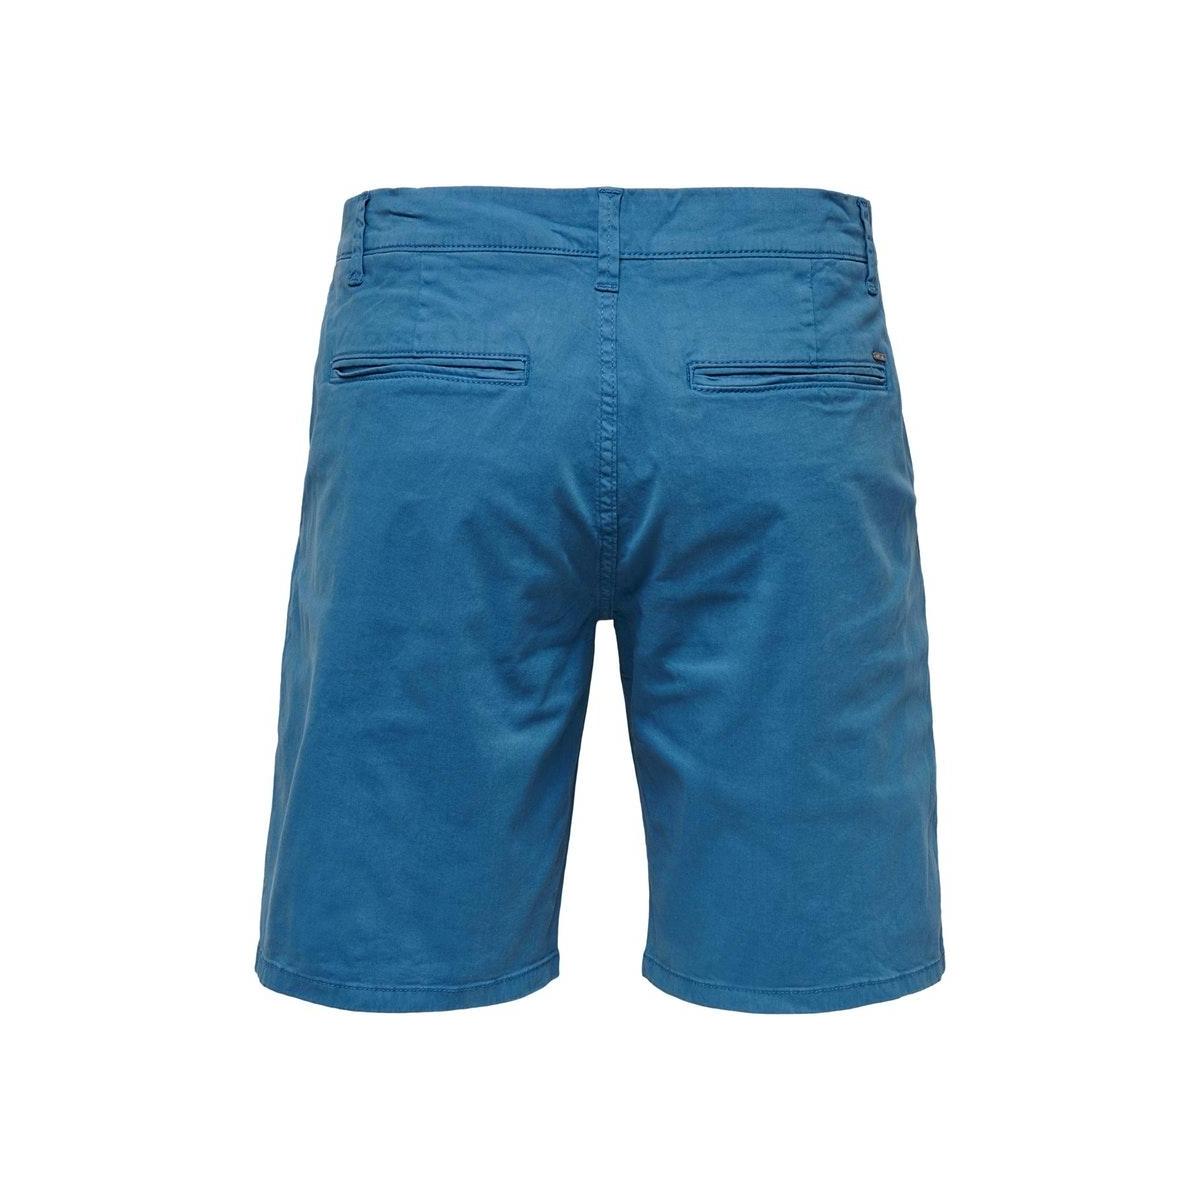 onsholm chino shorts  pk 2174 noos 22012174 only & sons korte broek dark blue